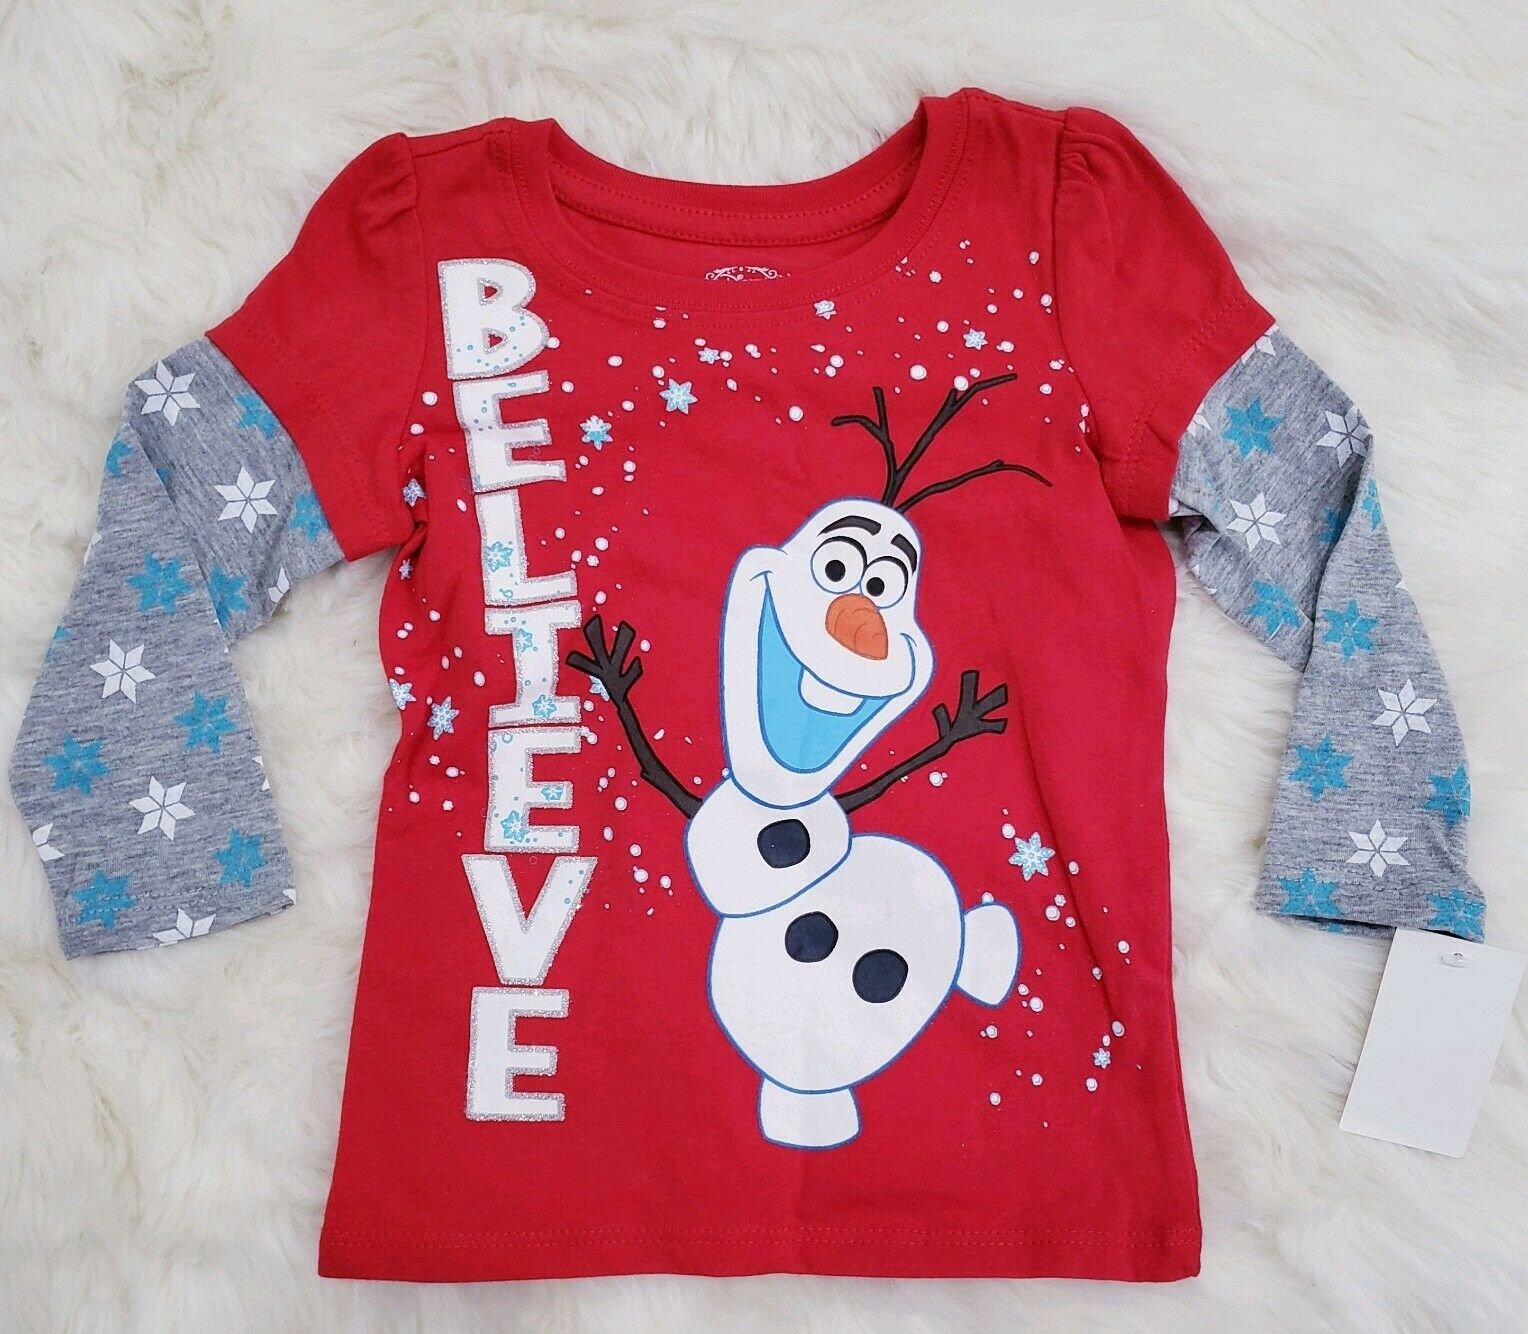 Girls Disney Frozen Olaf BELIEVE T-Shirt Top sz 2t  new nwt long sleeve